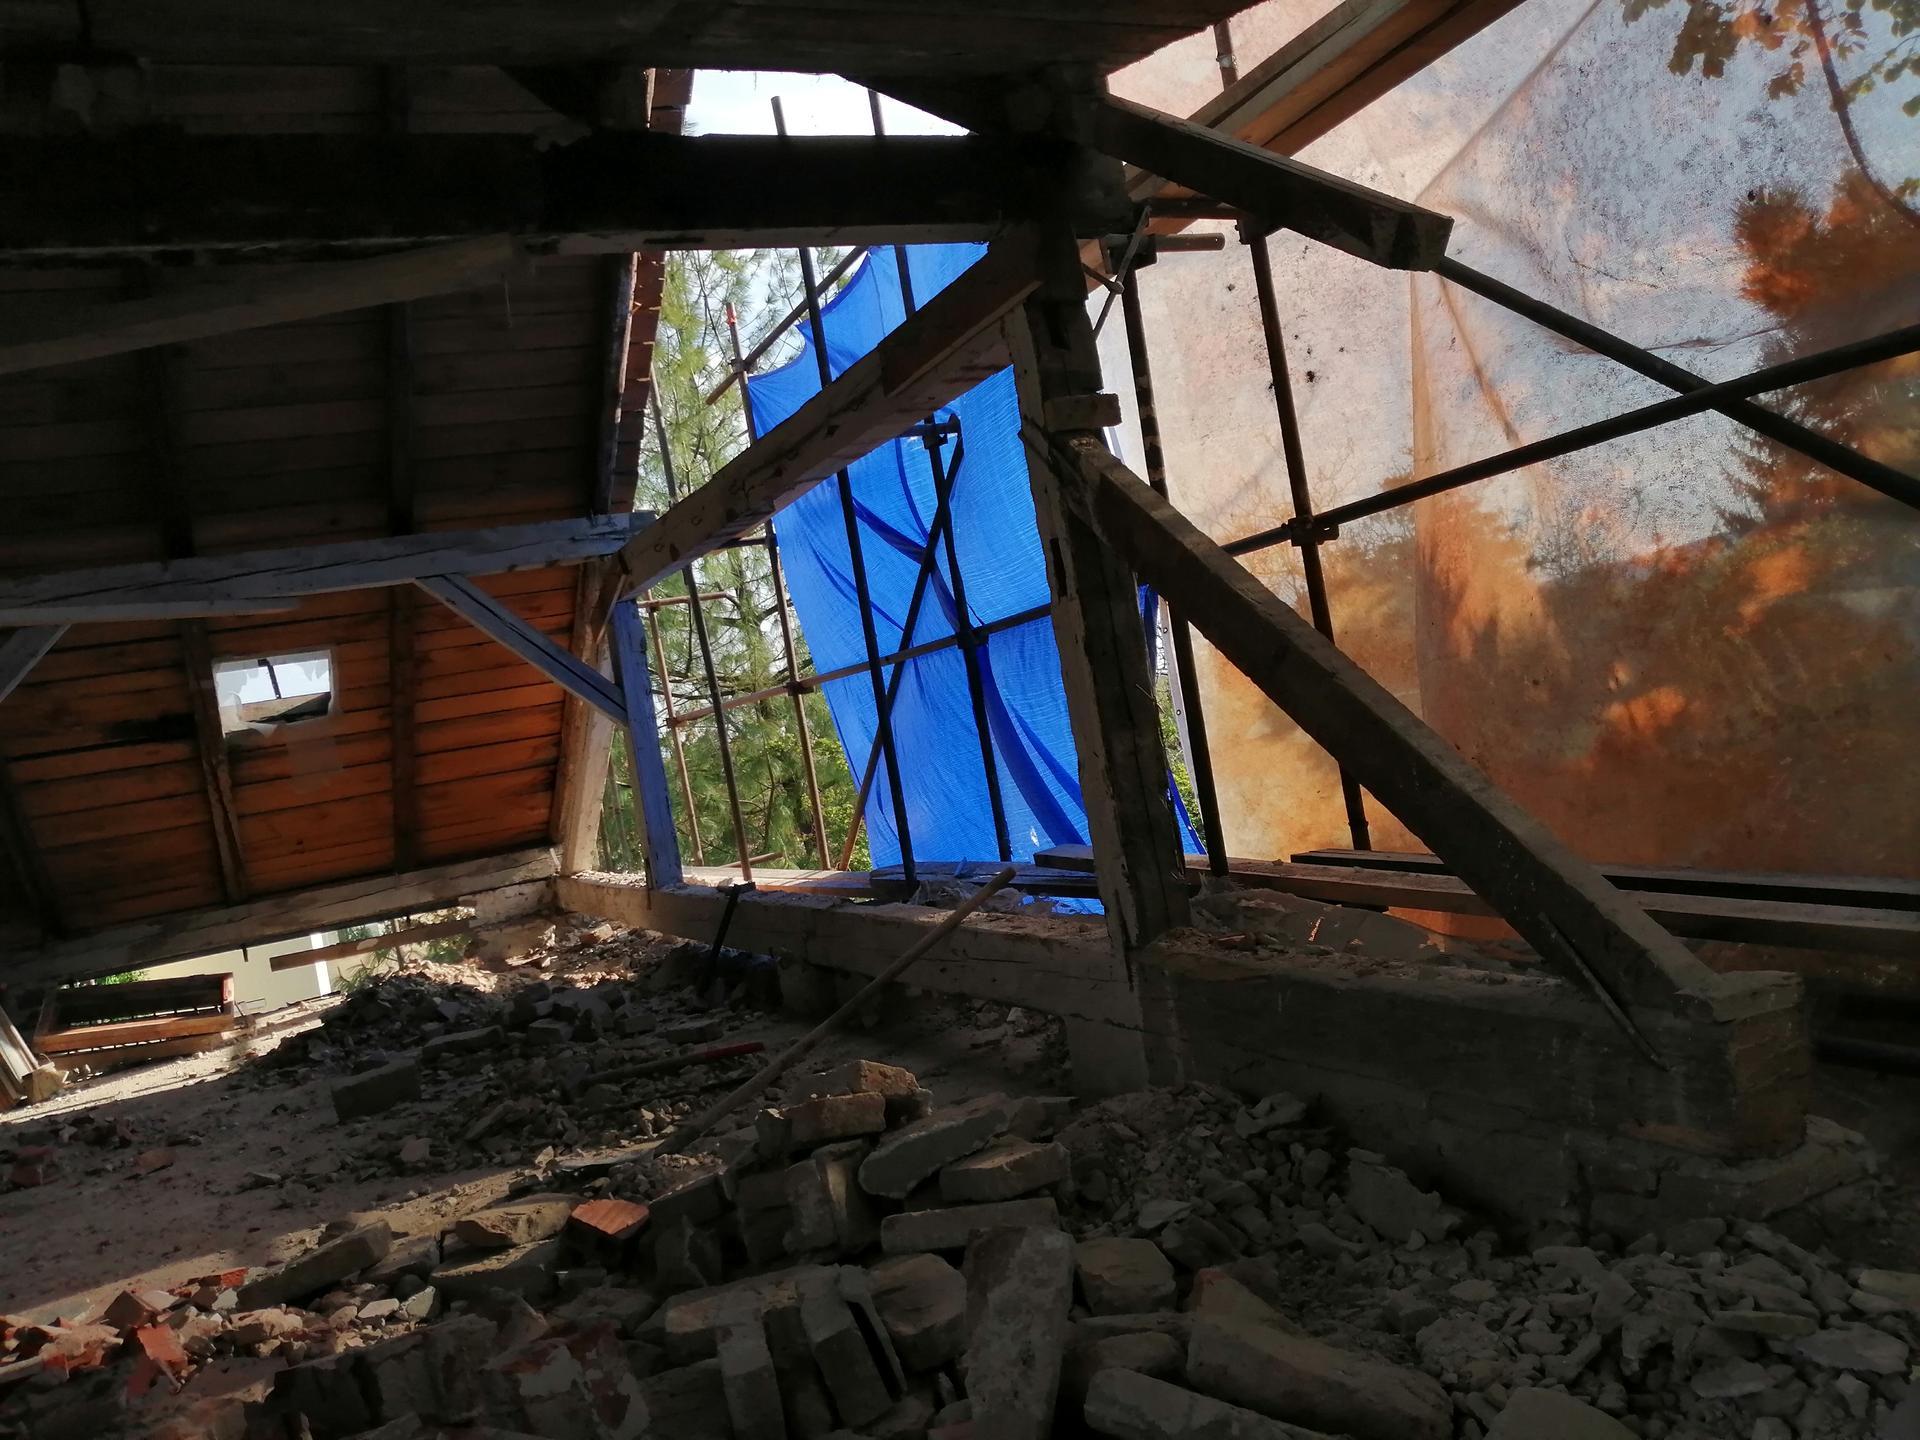 Prestavba podkrovia zo sedlovo valbovej na sedlovú strechu. - Obrázok č. 48